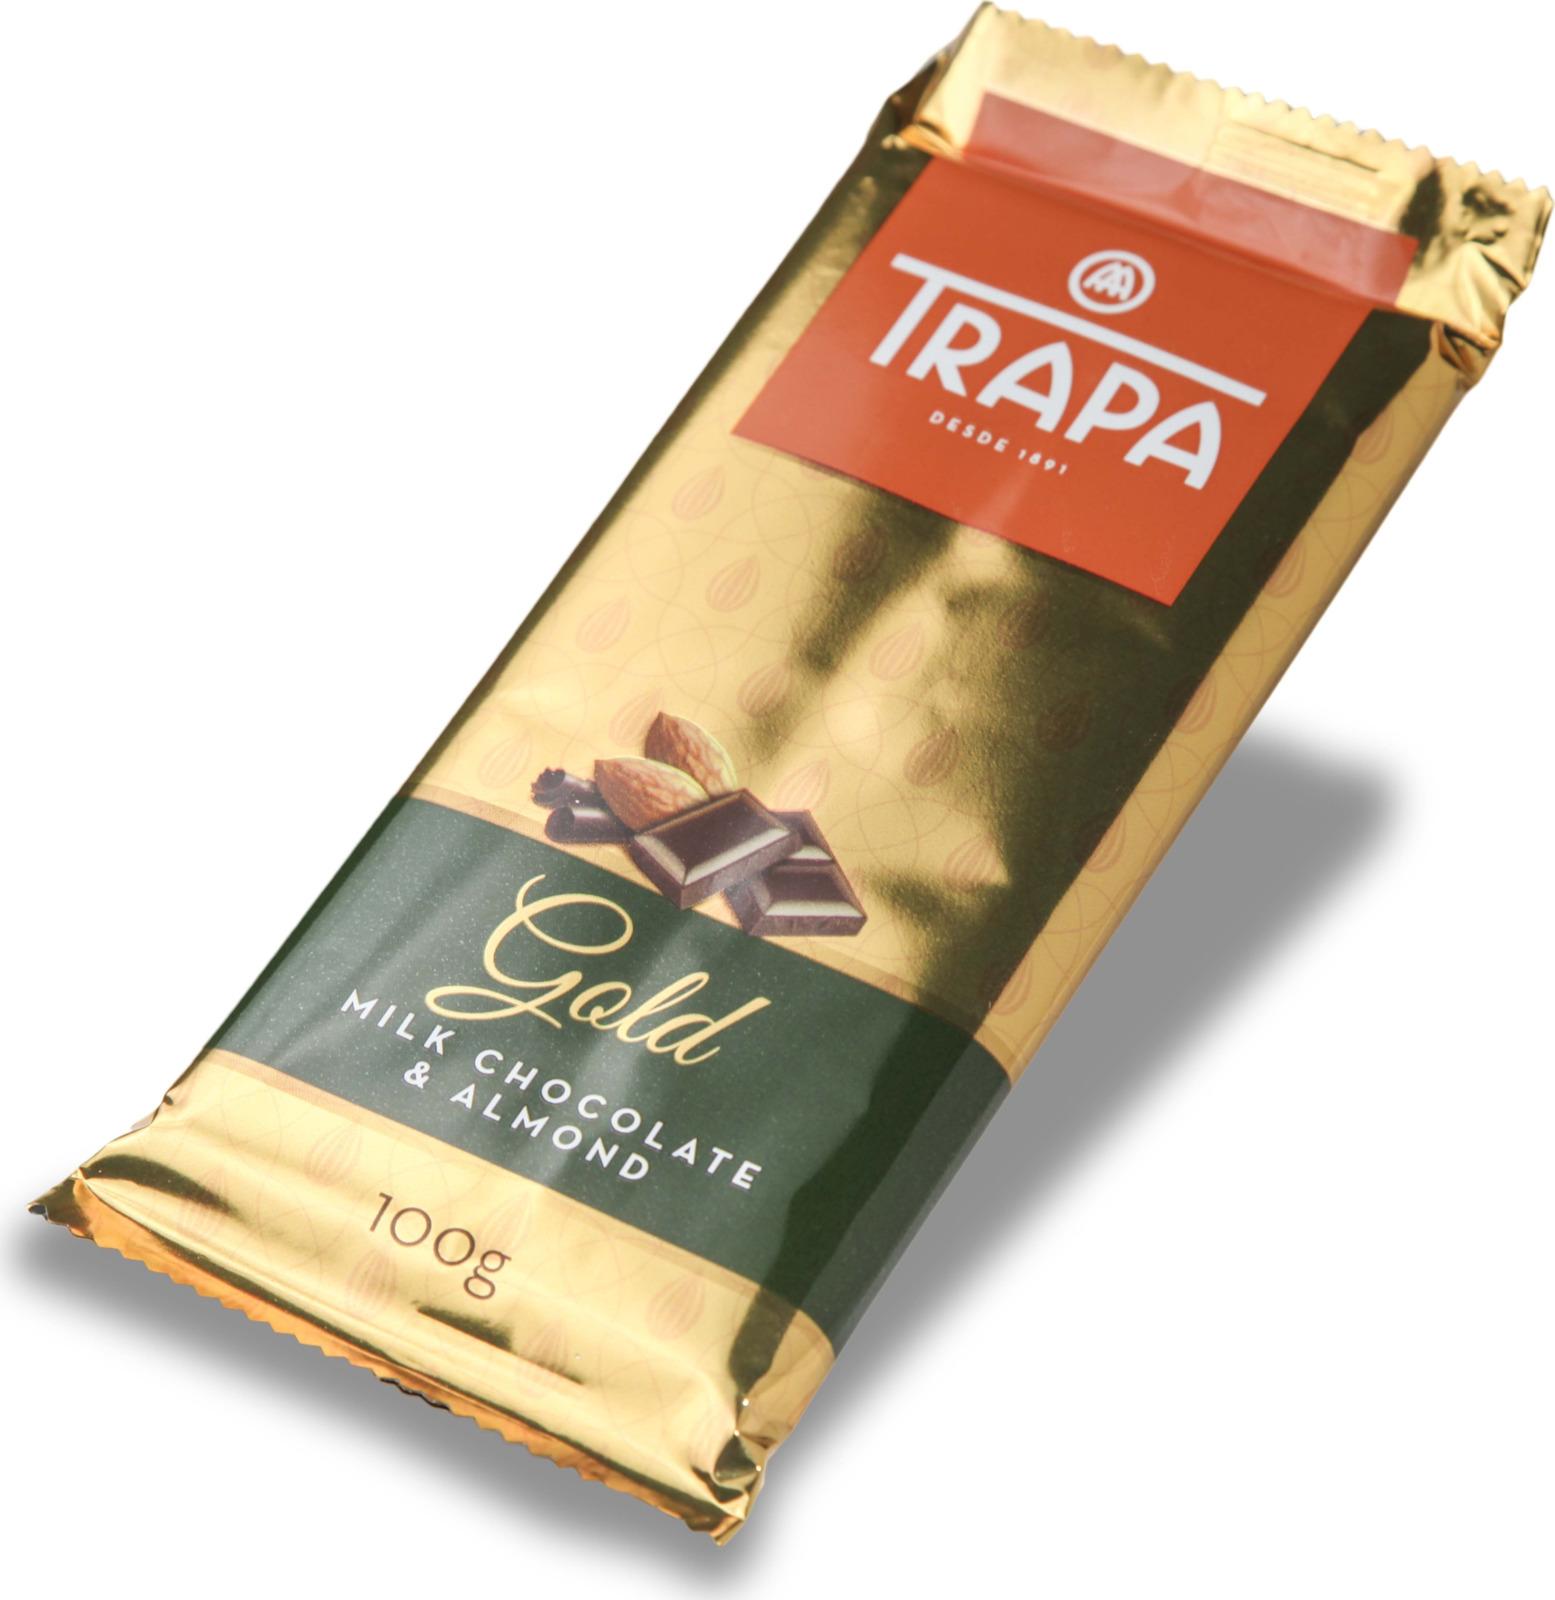 Молочный шоколад Trapa Gold Bar, с миндалем, 100 г цены онлайн